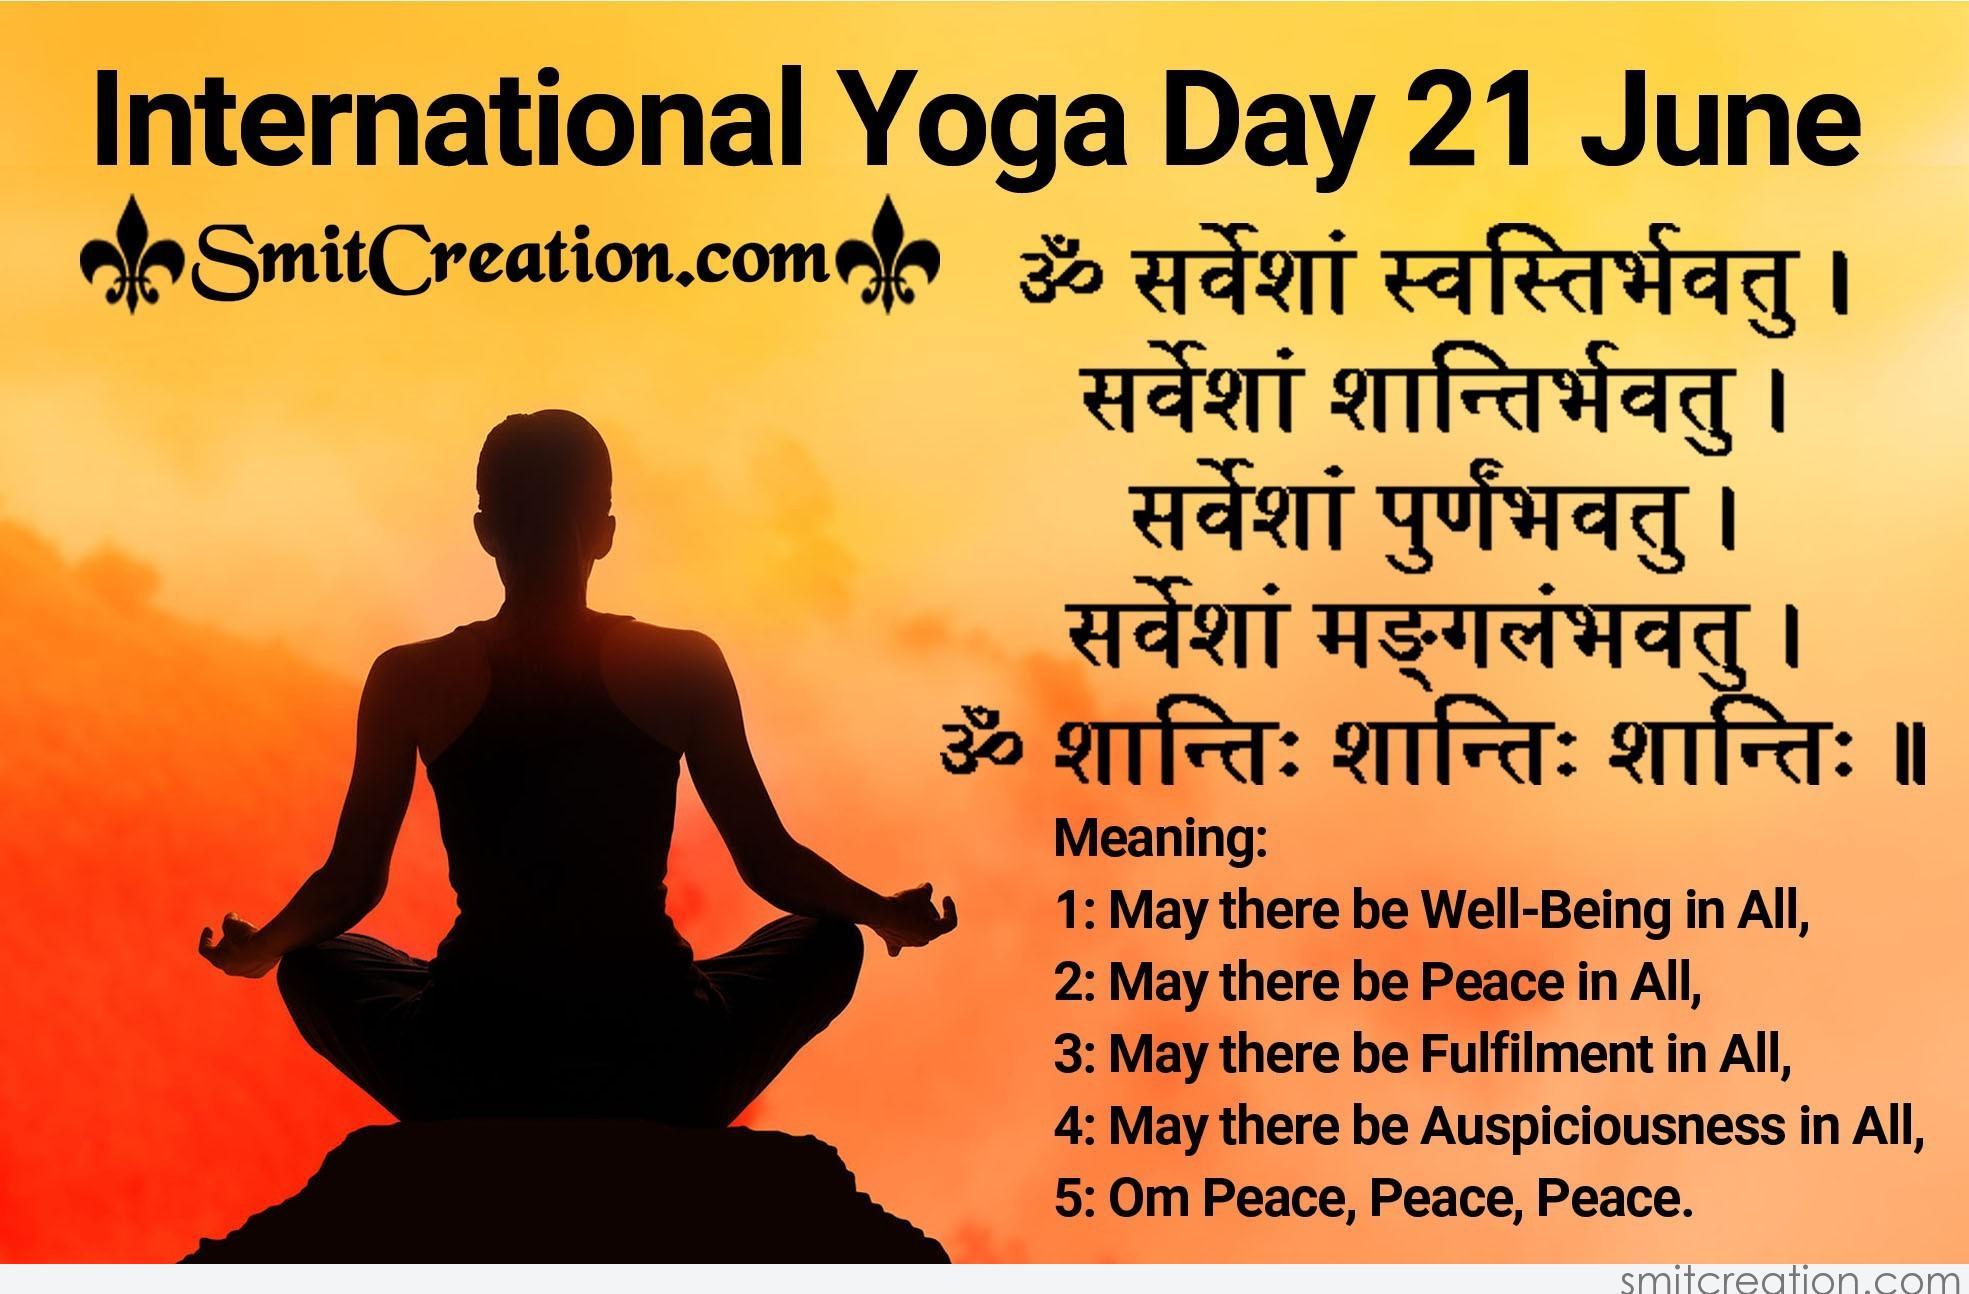 International Yoga Day 21 June Smitcreation Com